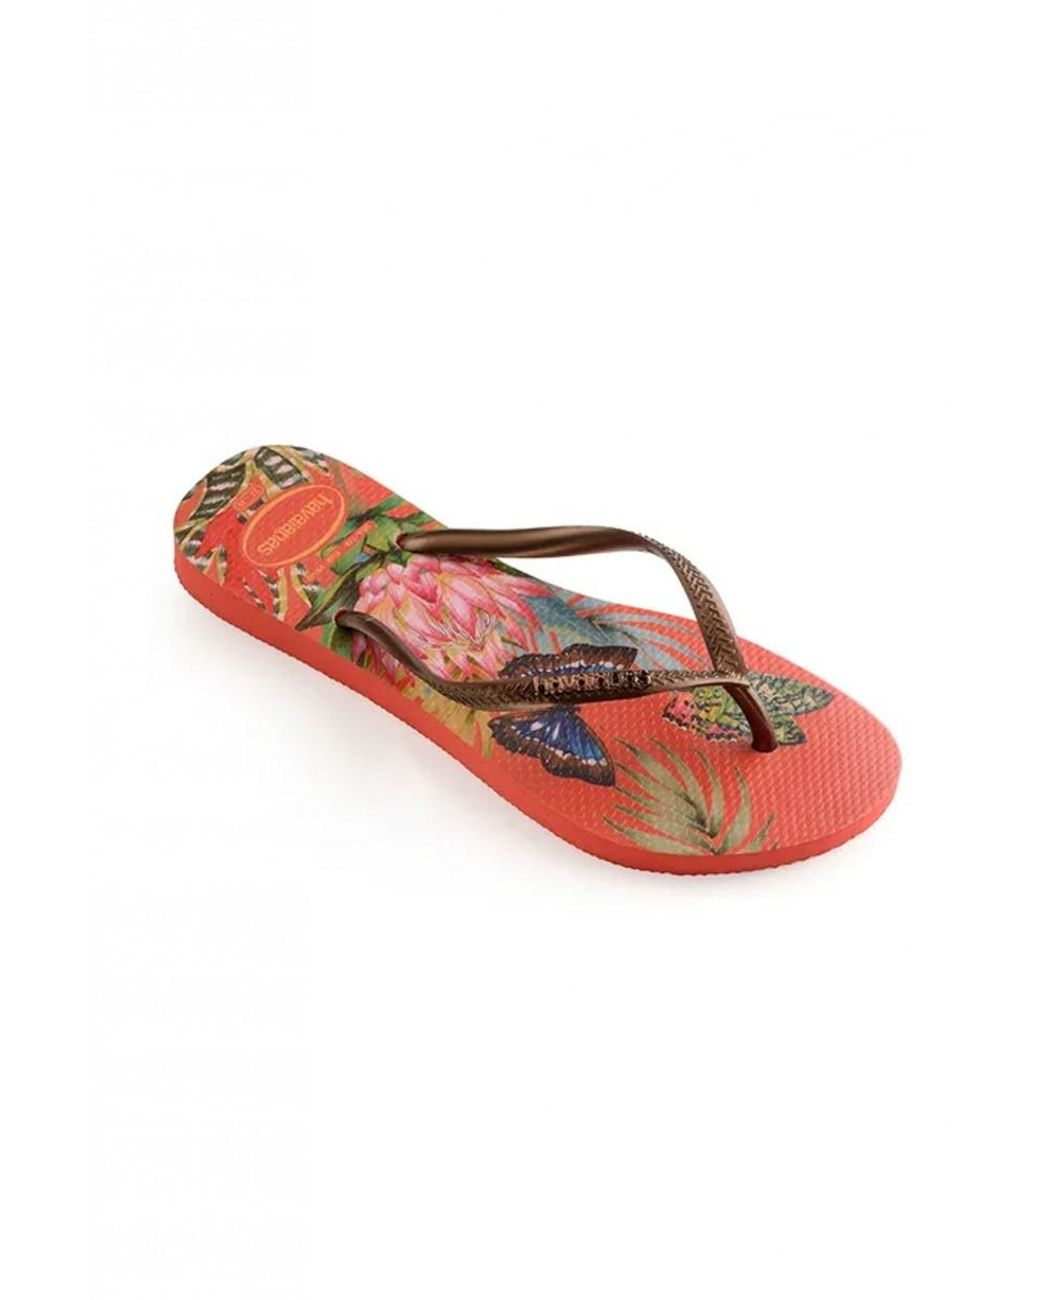 Ladies Jo /& Joe Tropical Ballerina Warm Pom Pom Slippers in Pink Blue /& Orange